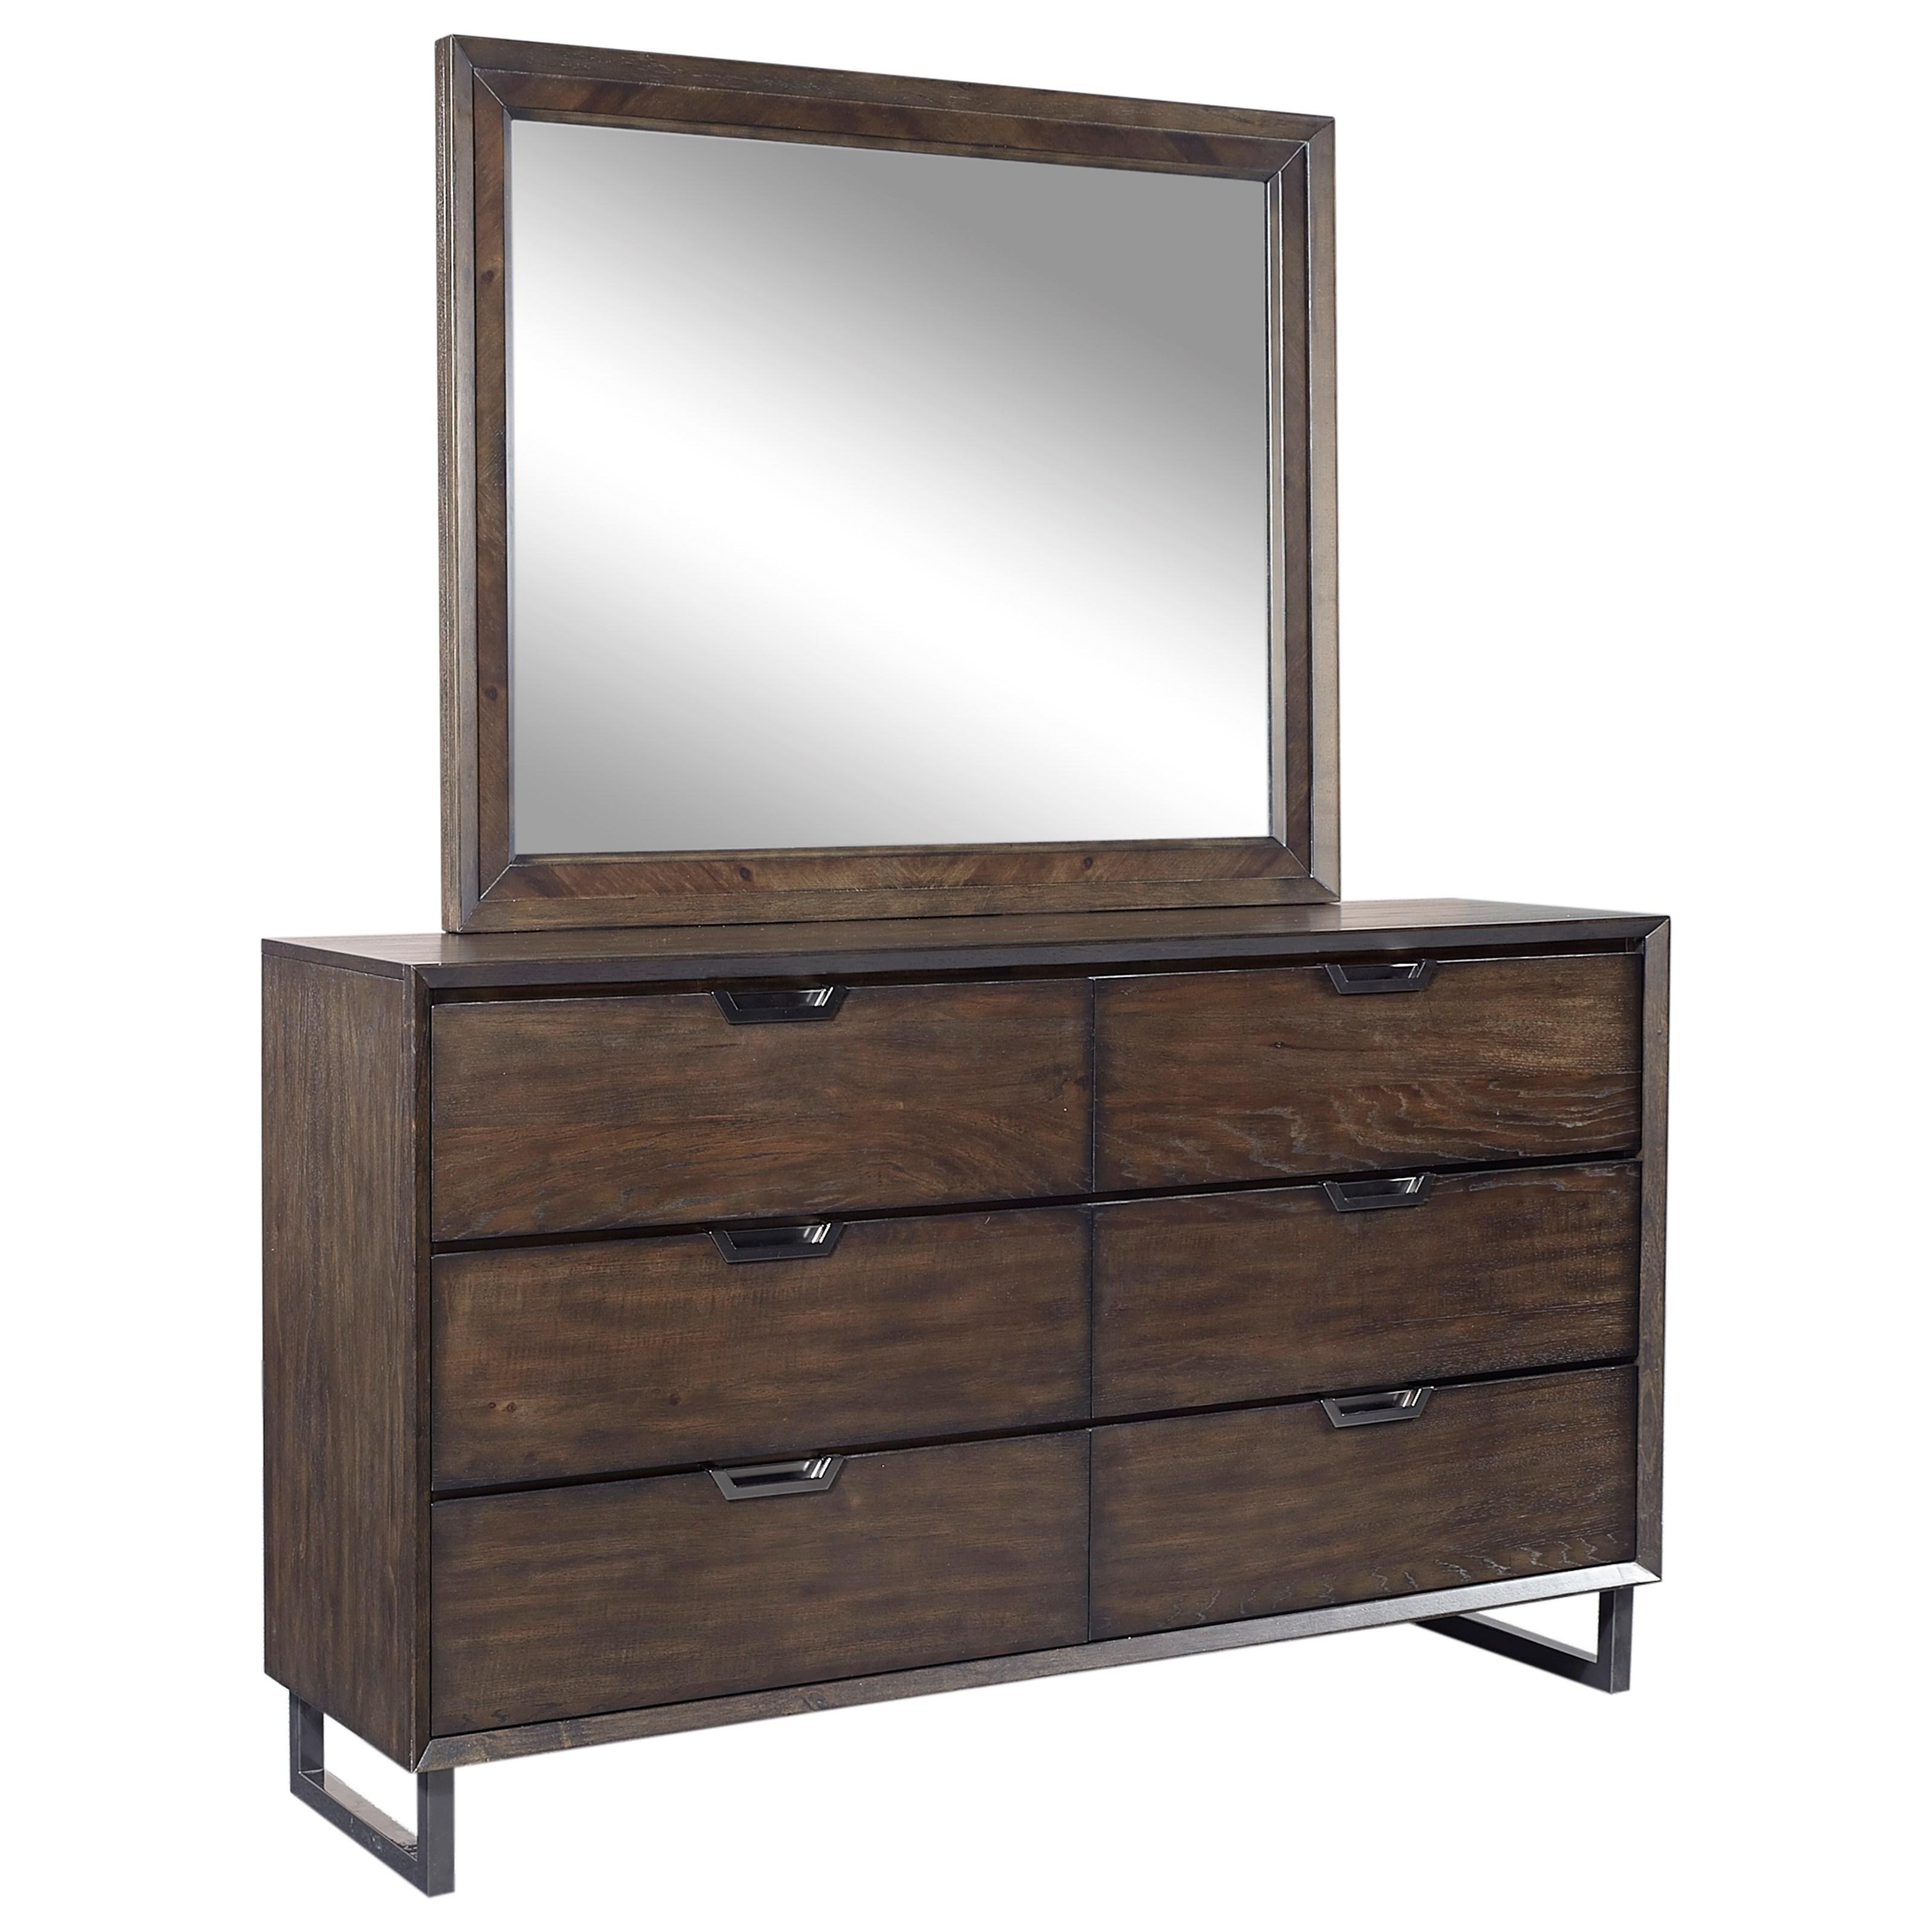 Aspenhome Harper Point 6 Drawer Dresser and Mirror  - Item Number: IHP-453+462